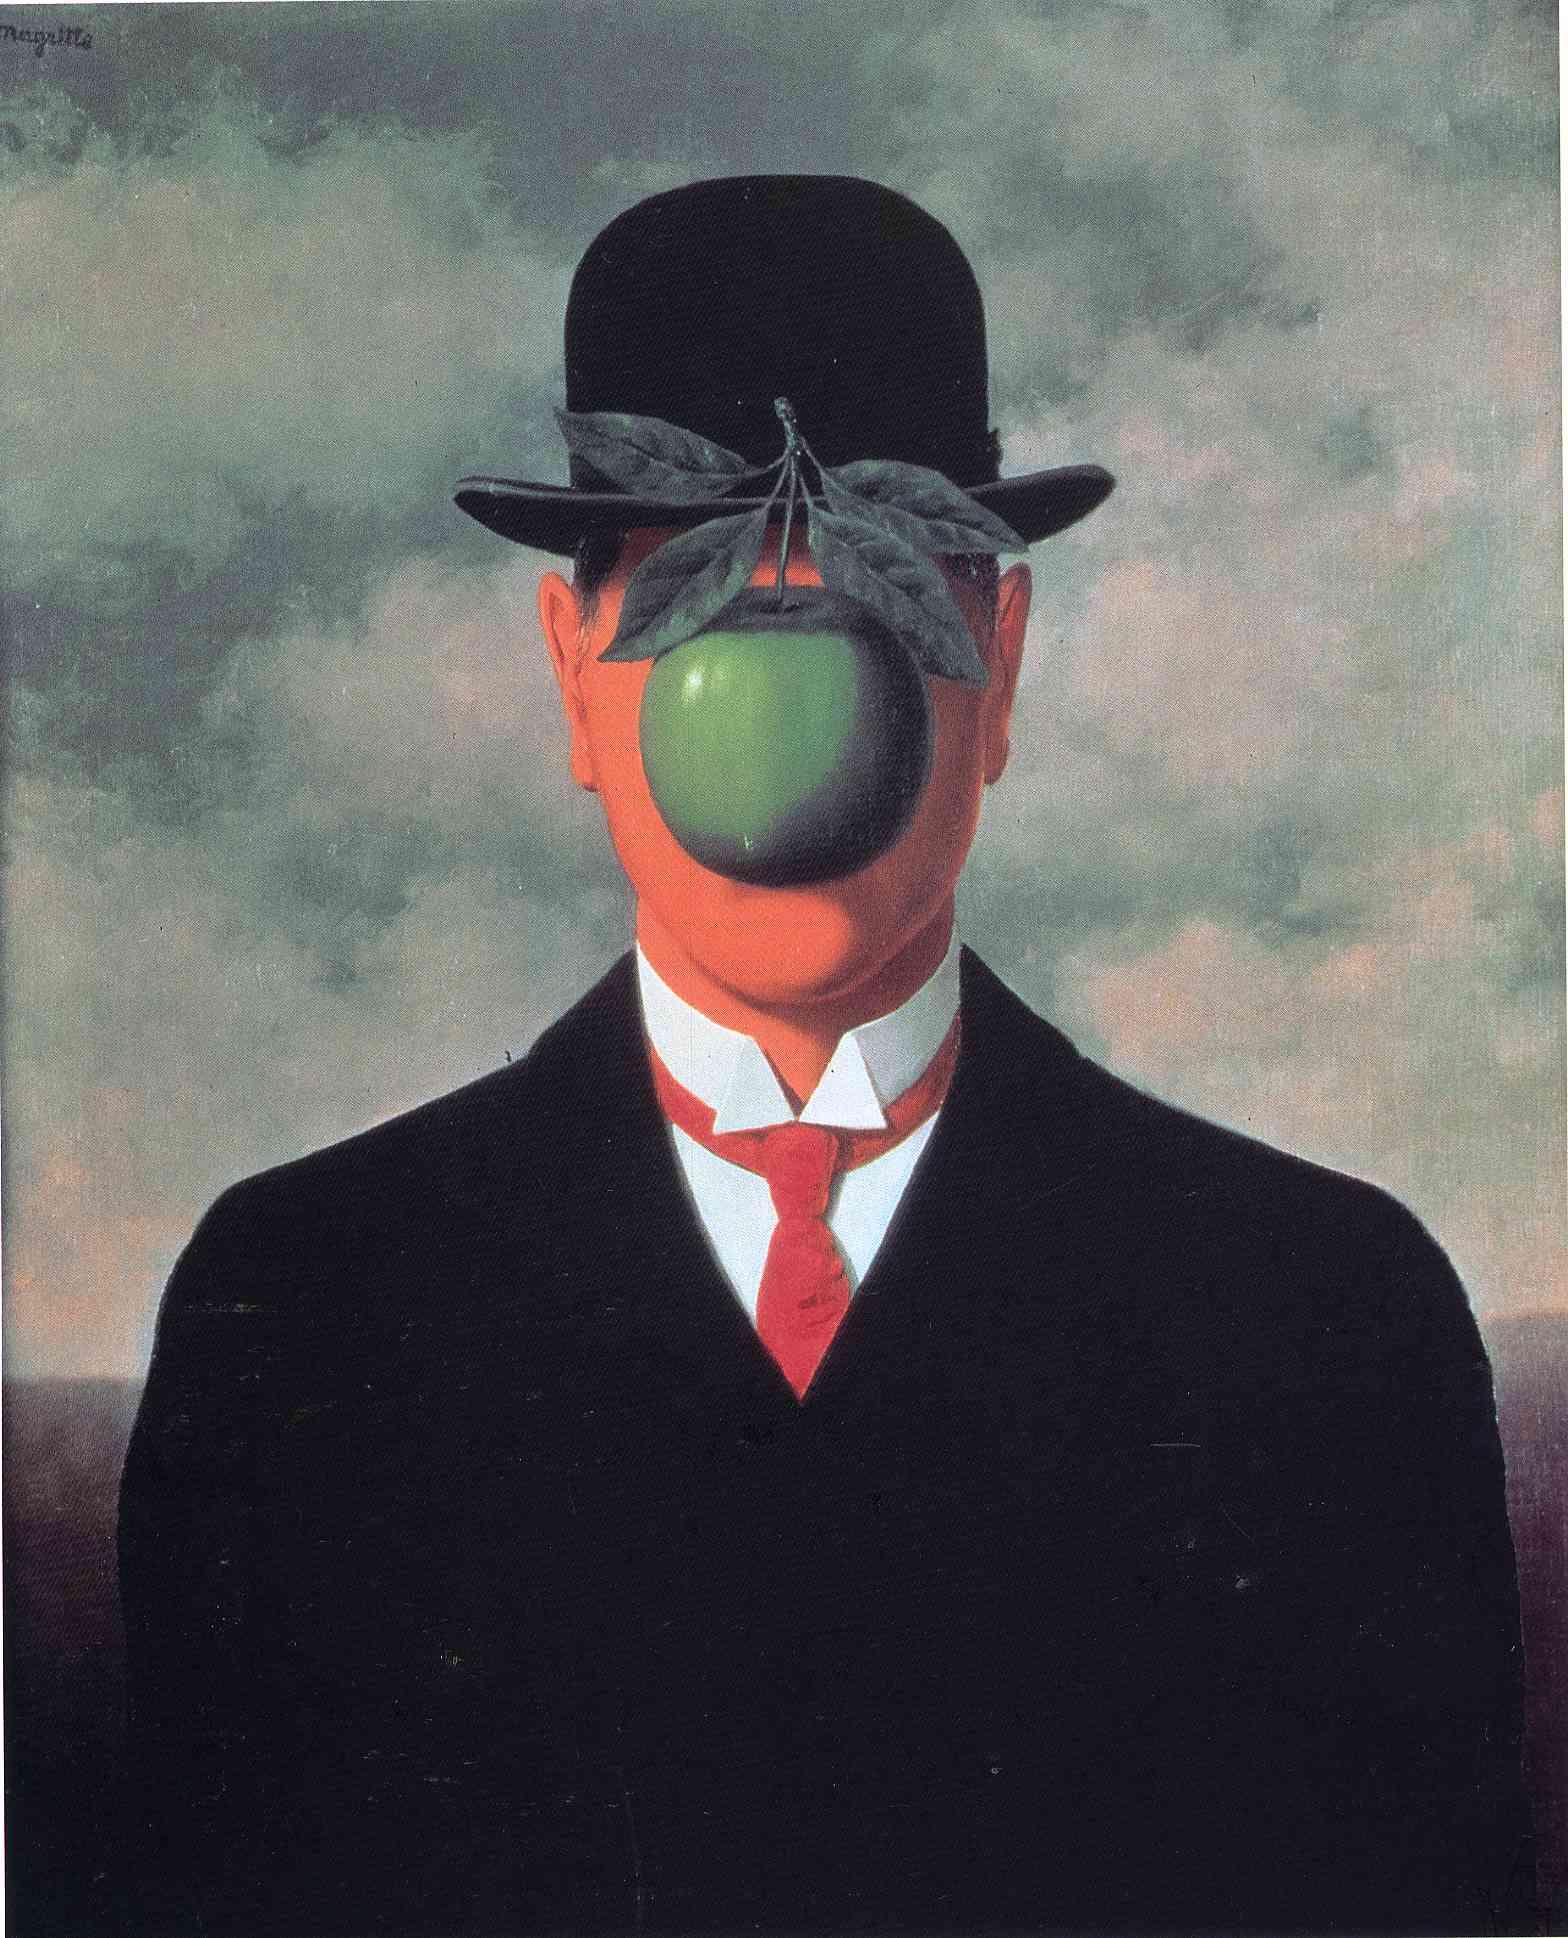 Rene Magritte Wallpaper 1568x1938 Rene Magritte Son Of Man 1568x1938